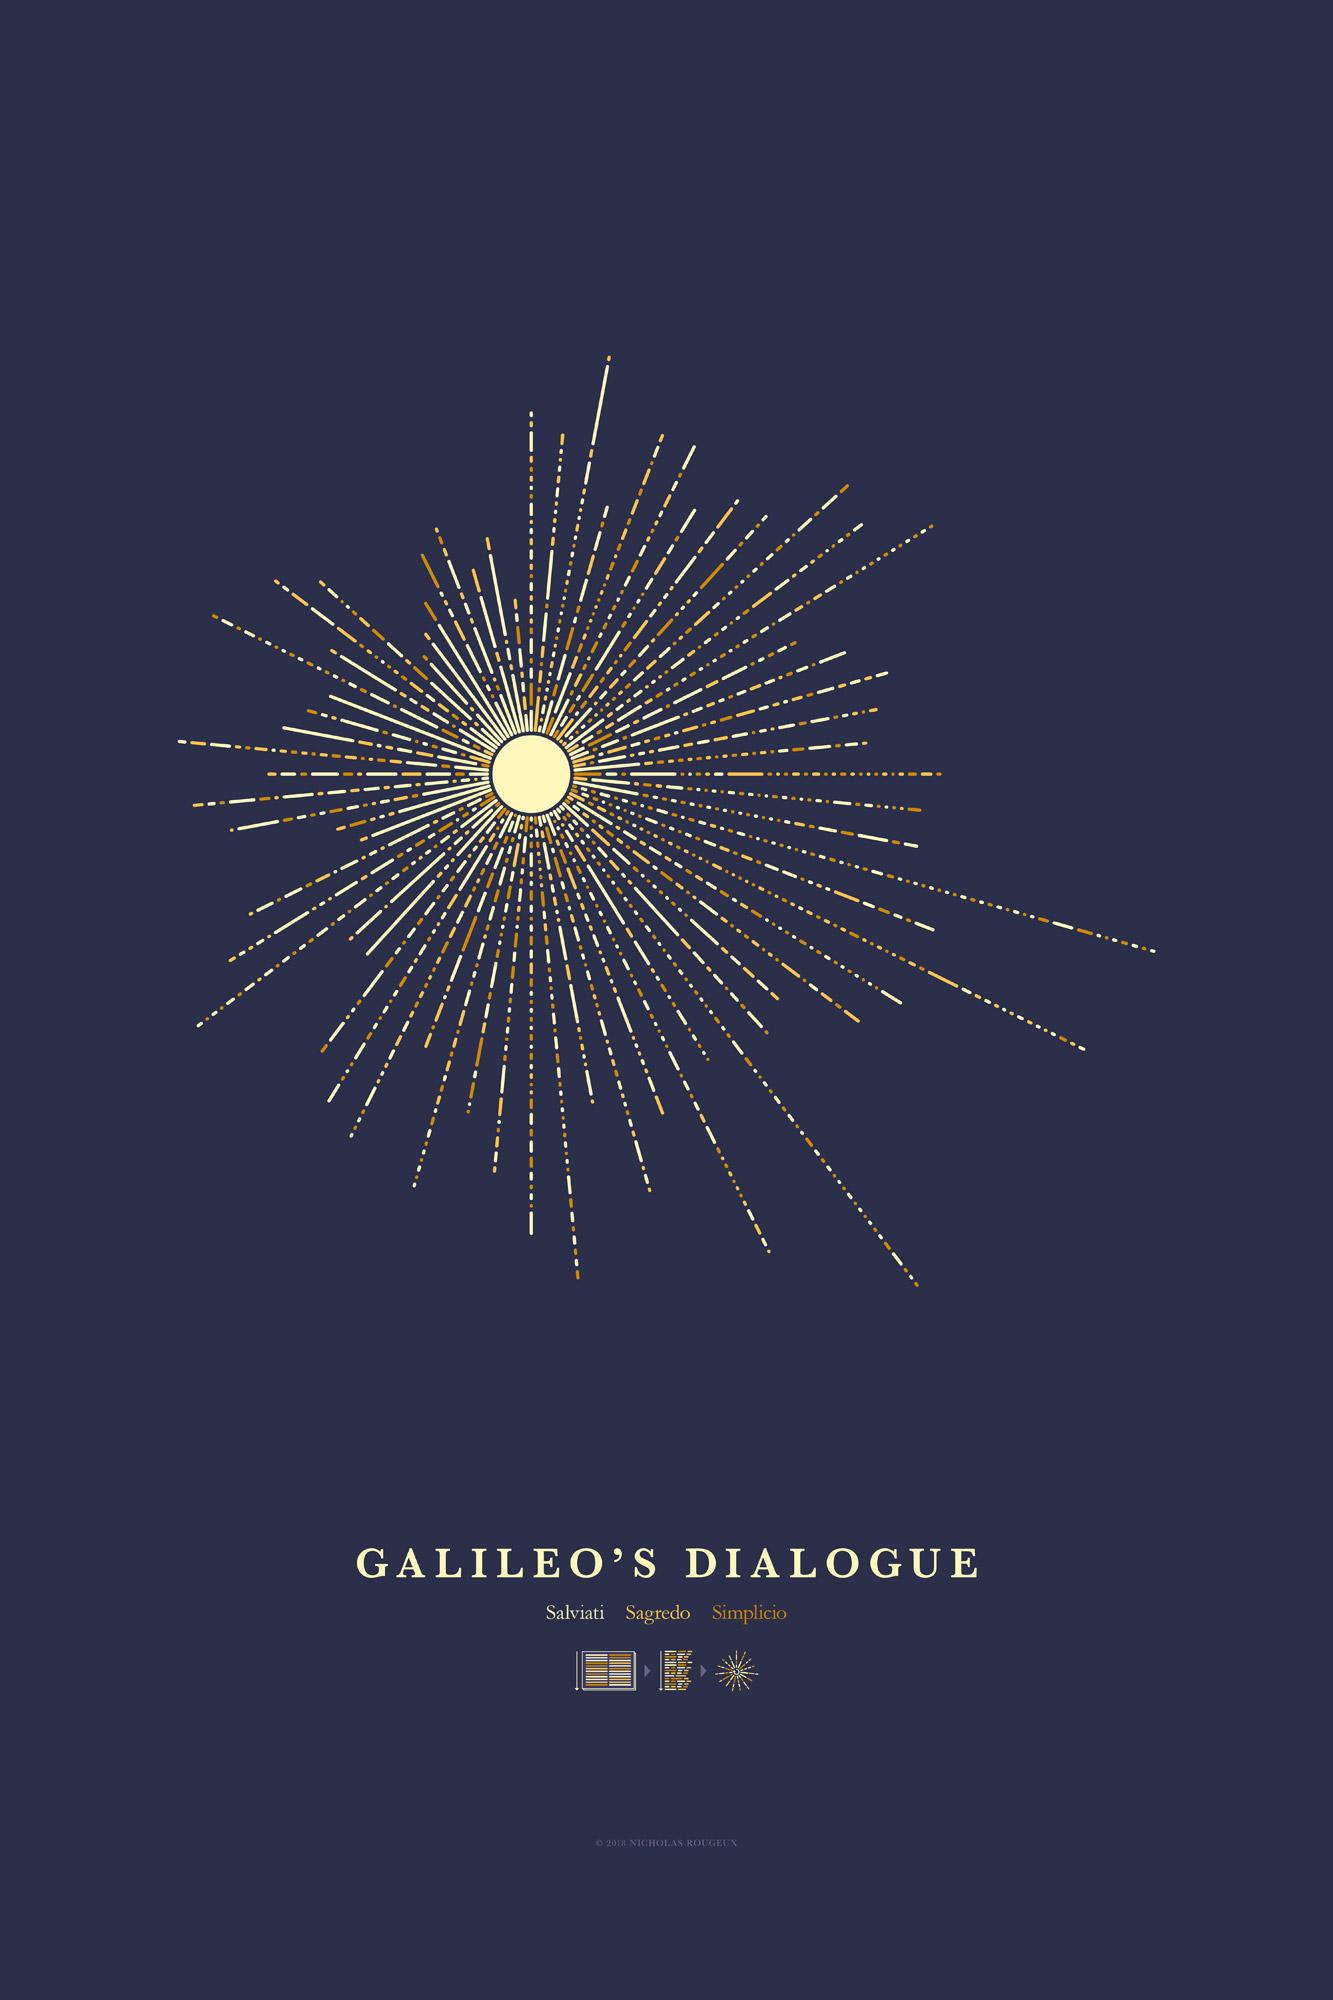 Galileo's Dialogue